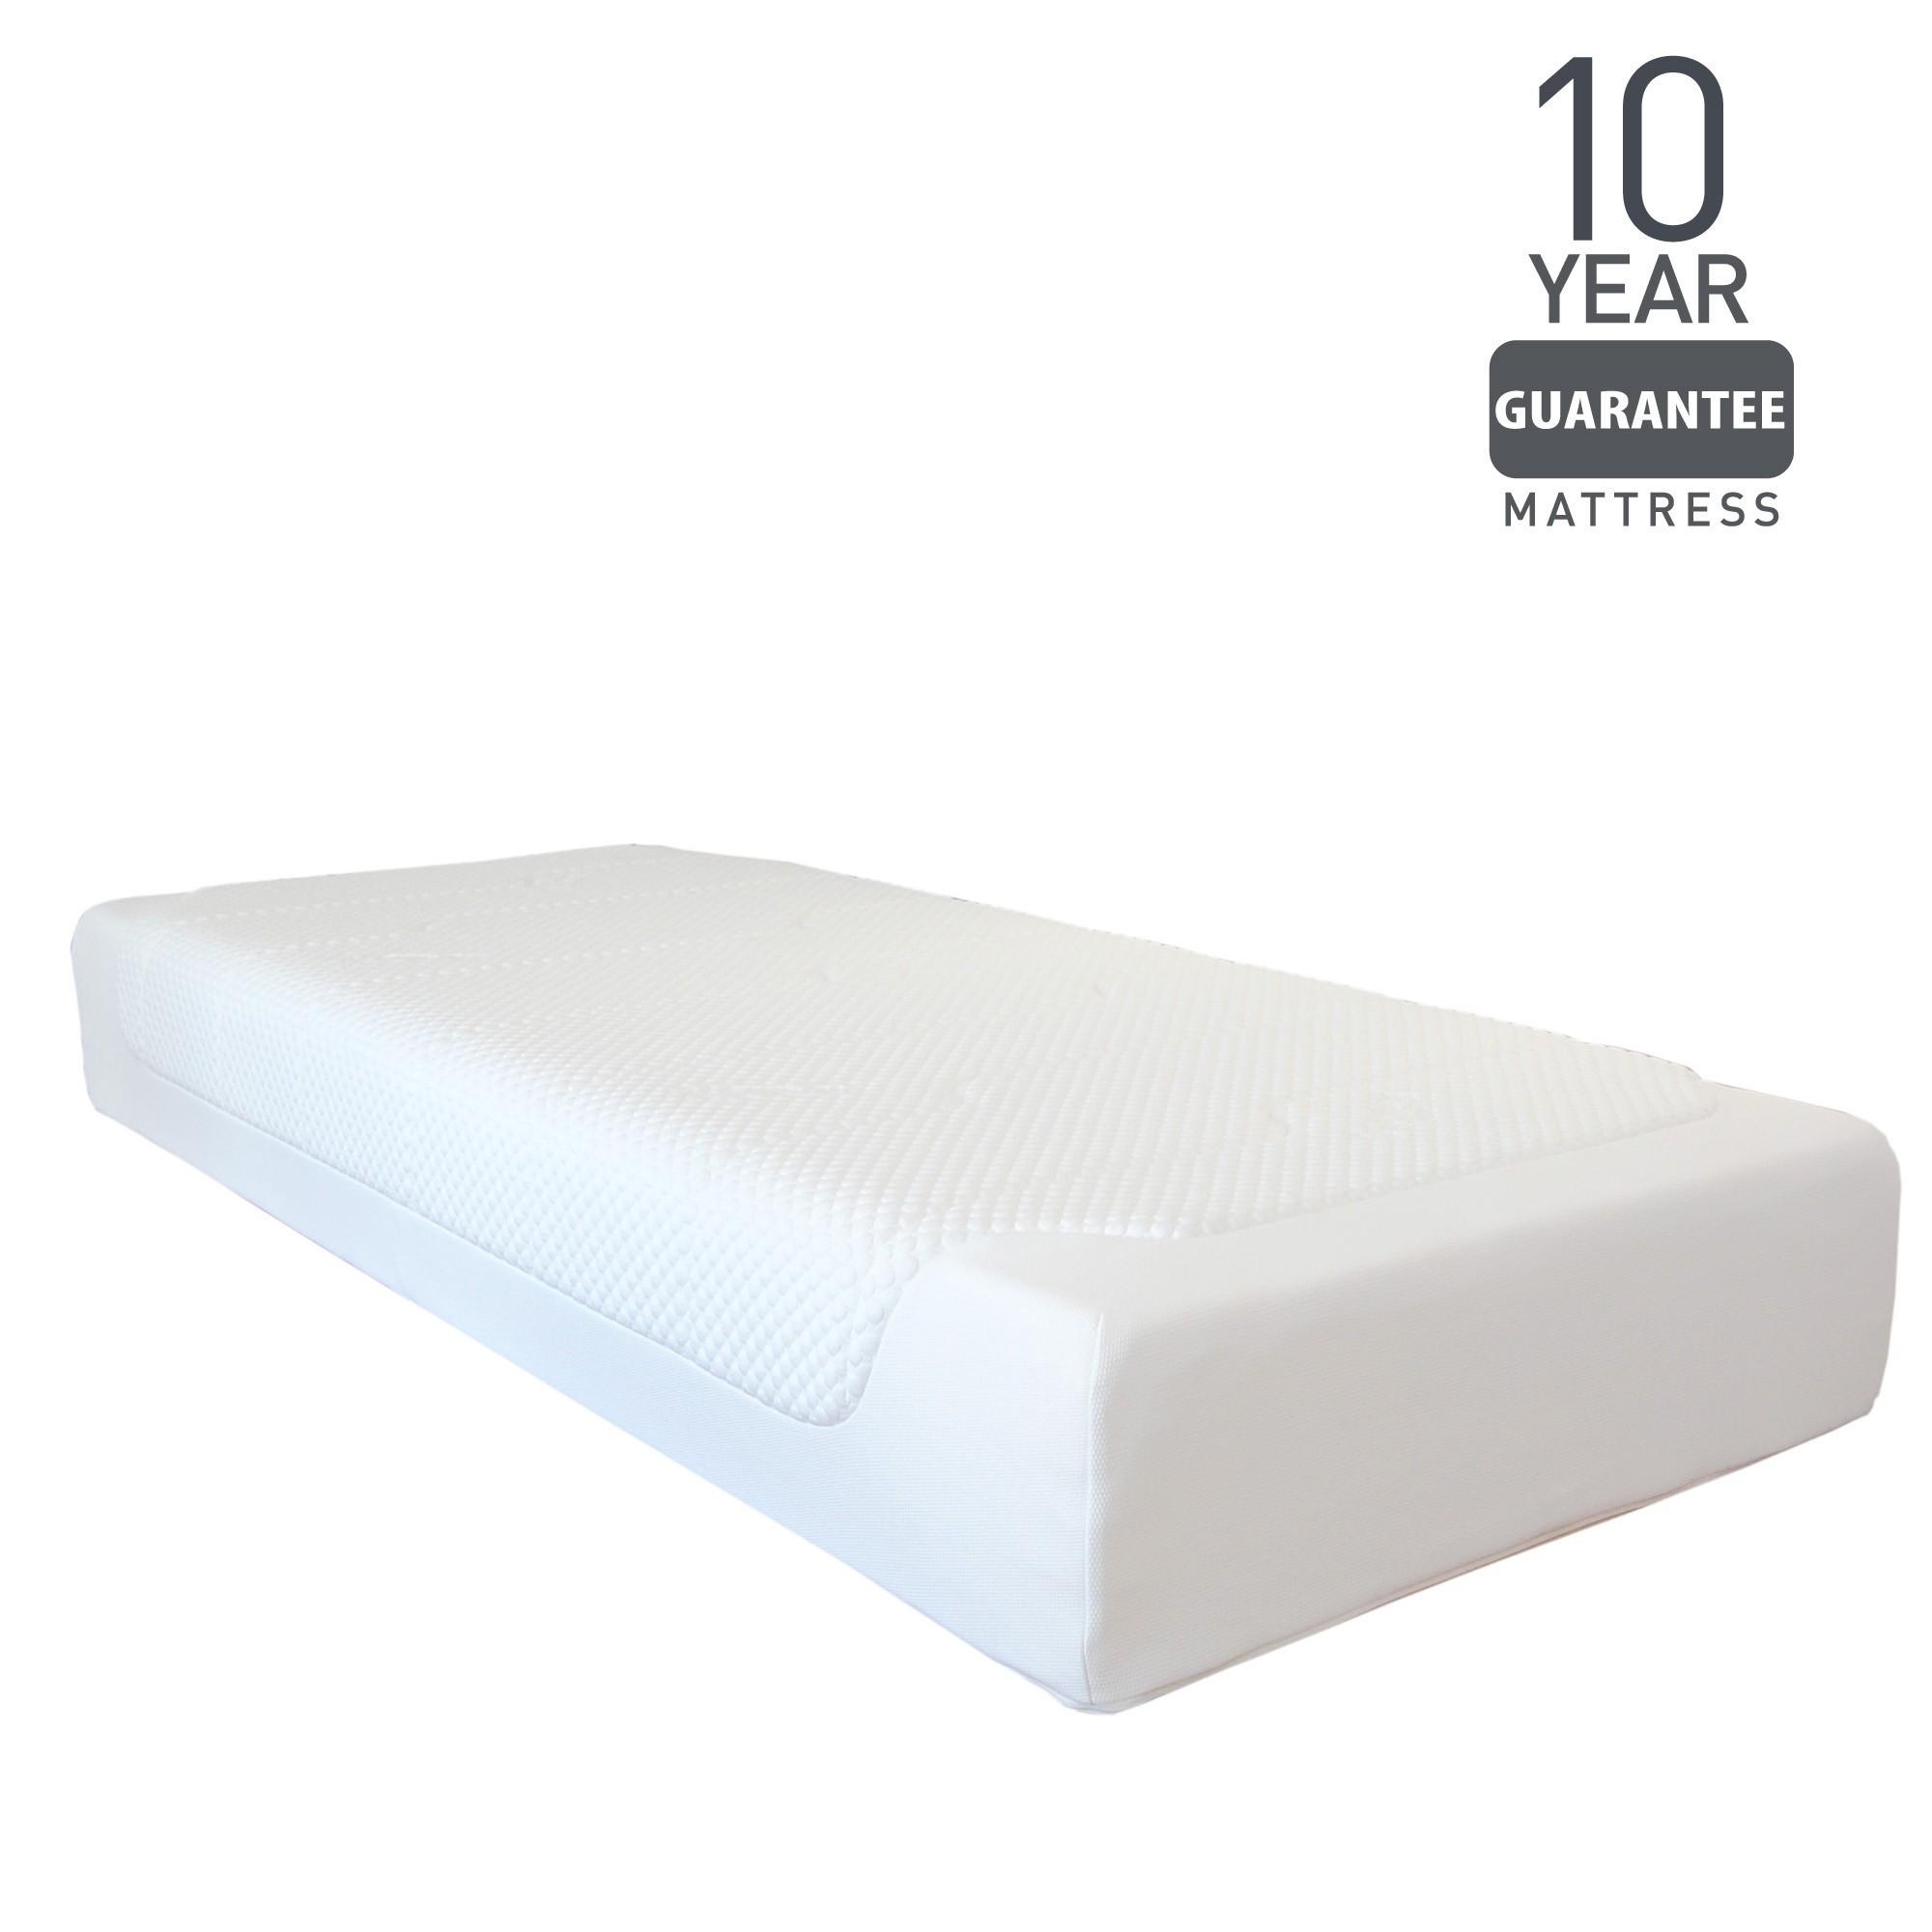 tempur cloud deluxe mattress 27 tempur cookes furniture. Black Bedroom Furniture Sets. Home Design Ideas